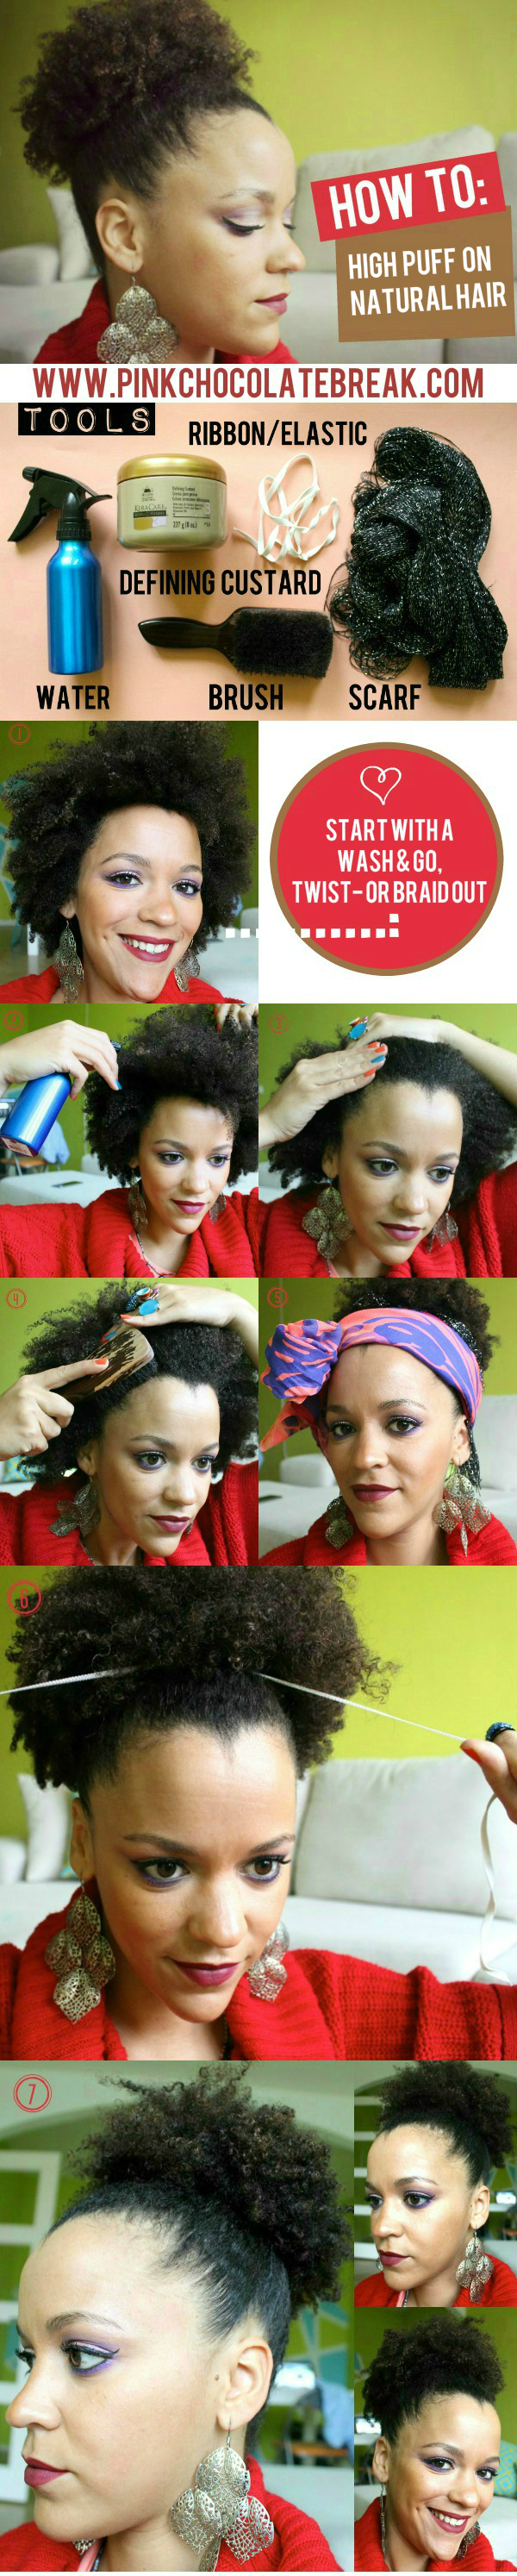 how to high bun on natural hair 11